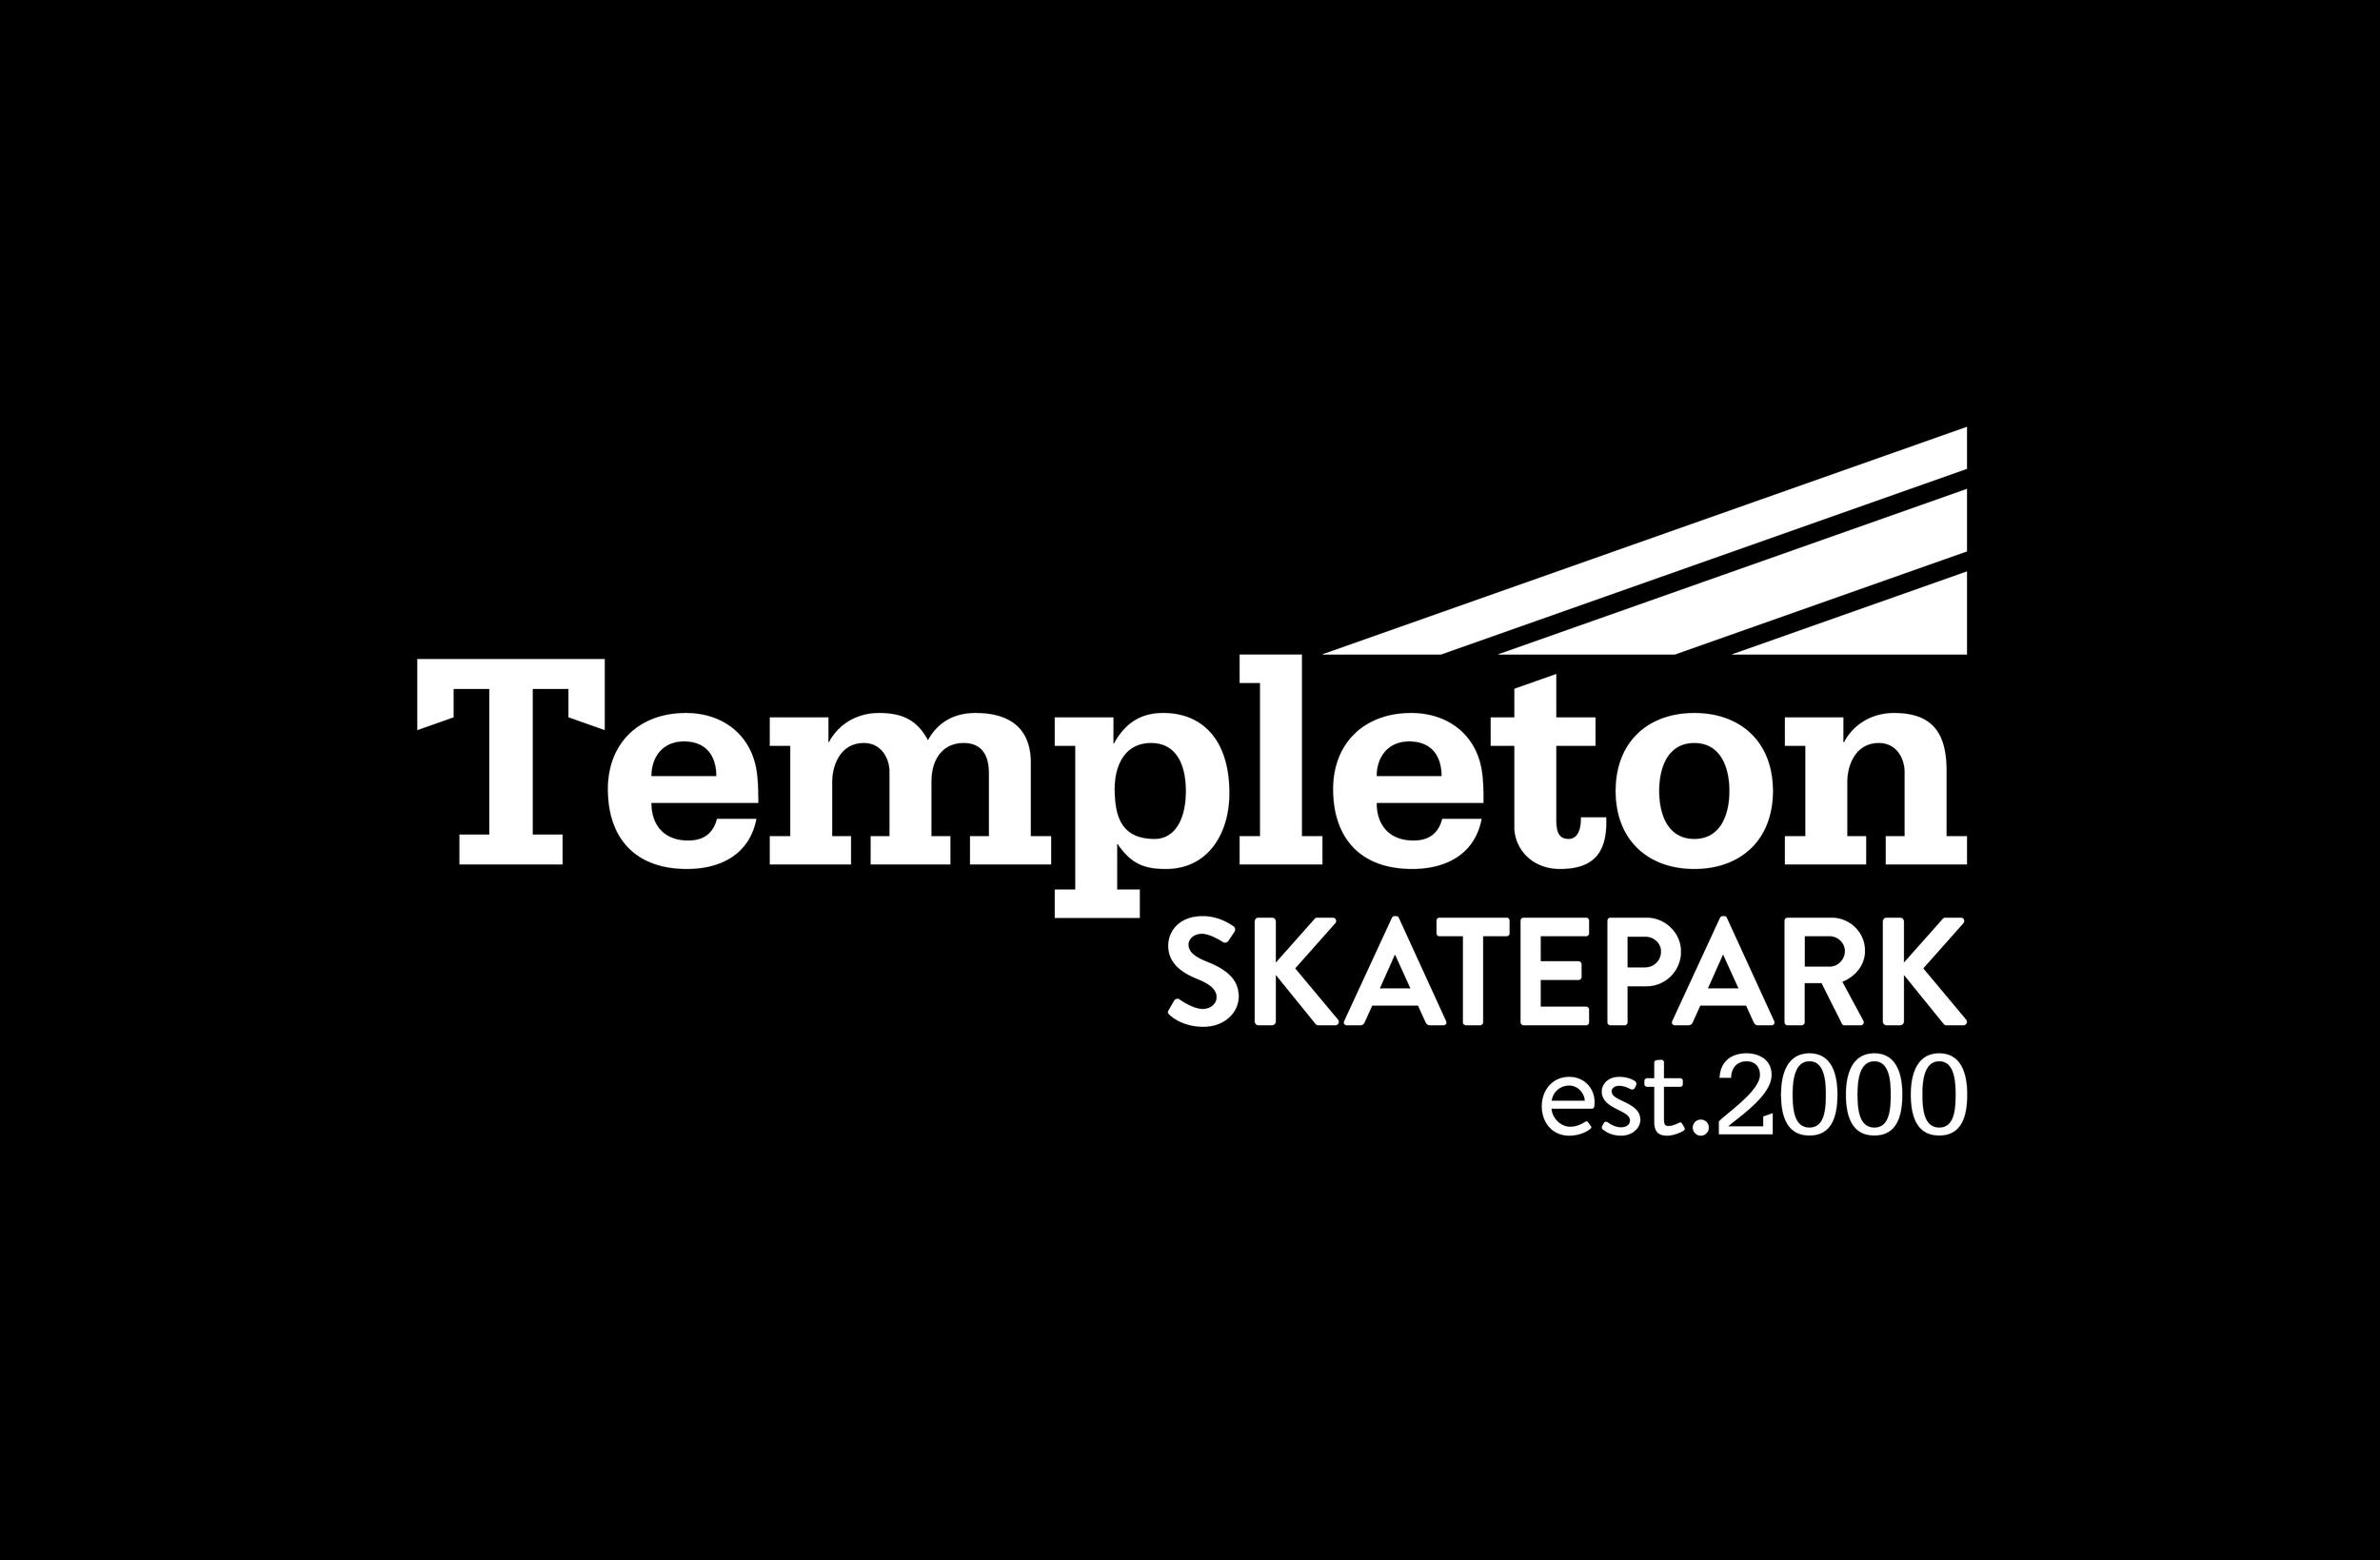 Templeton skatepark logos K web.jpg